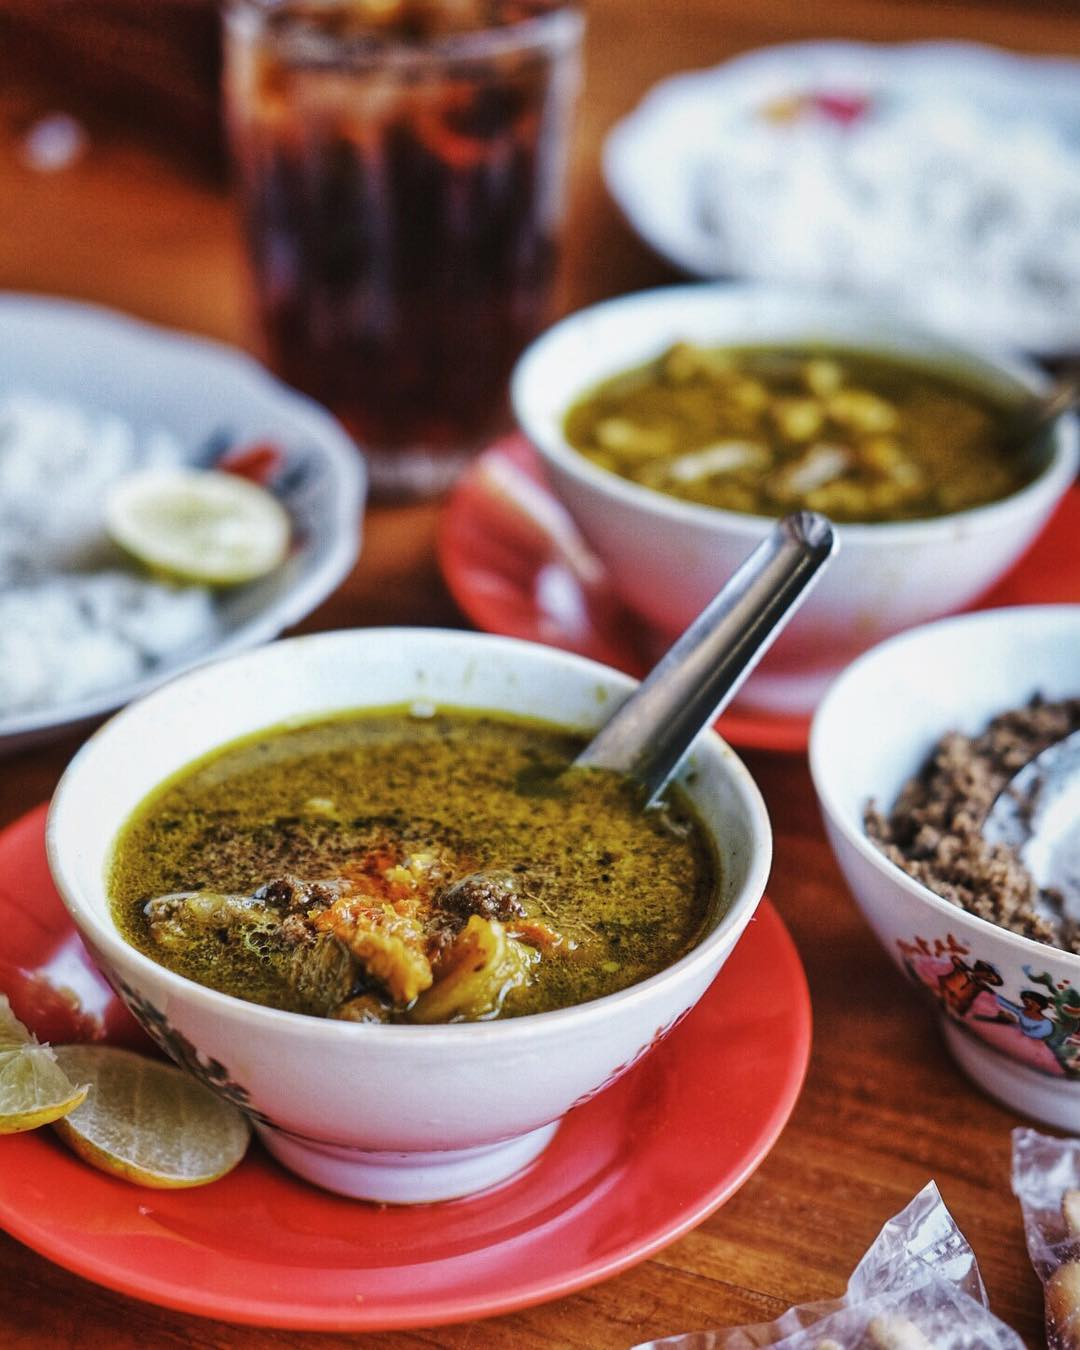 18 Makanan Khas Makassar Dan Tempat Untuk Mencobanya